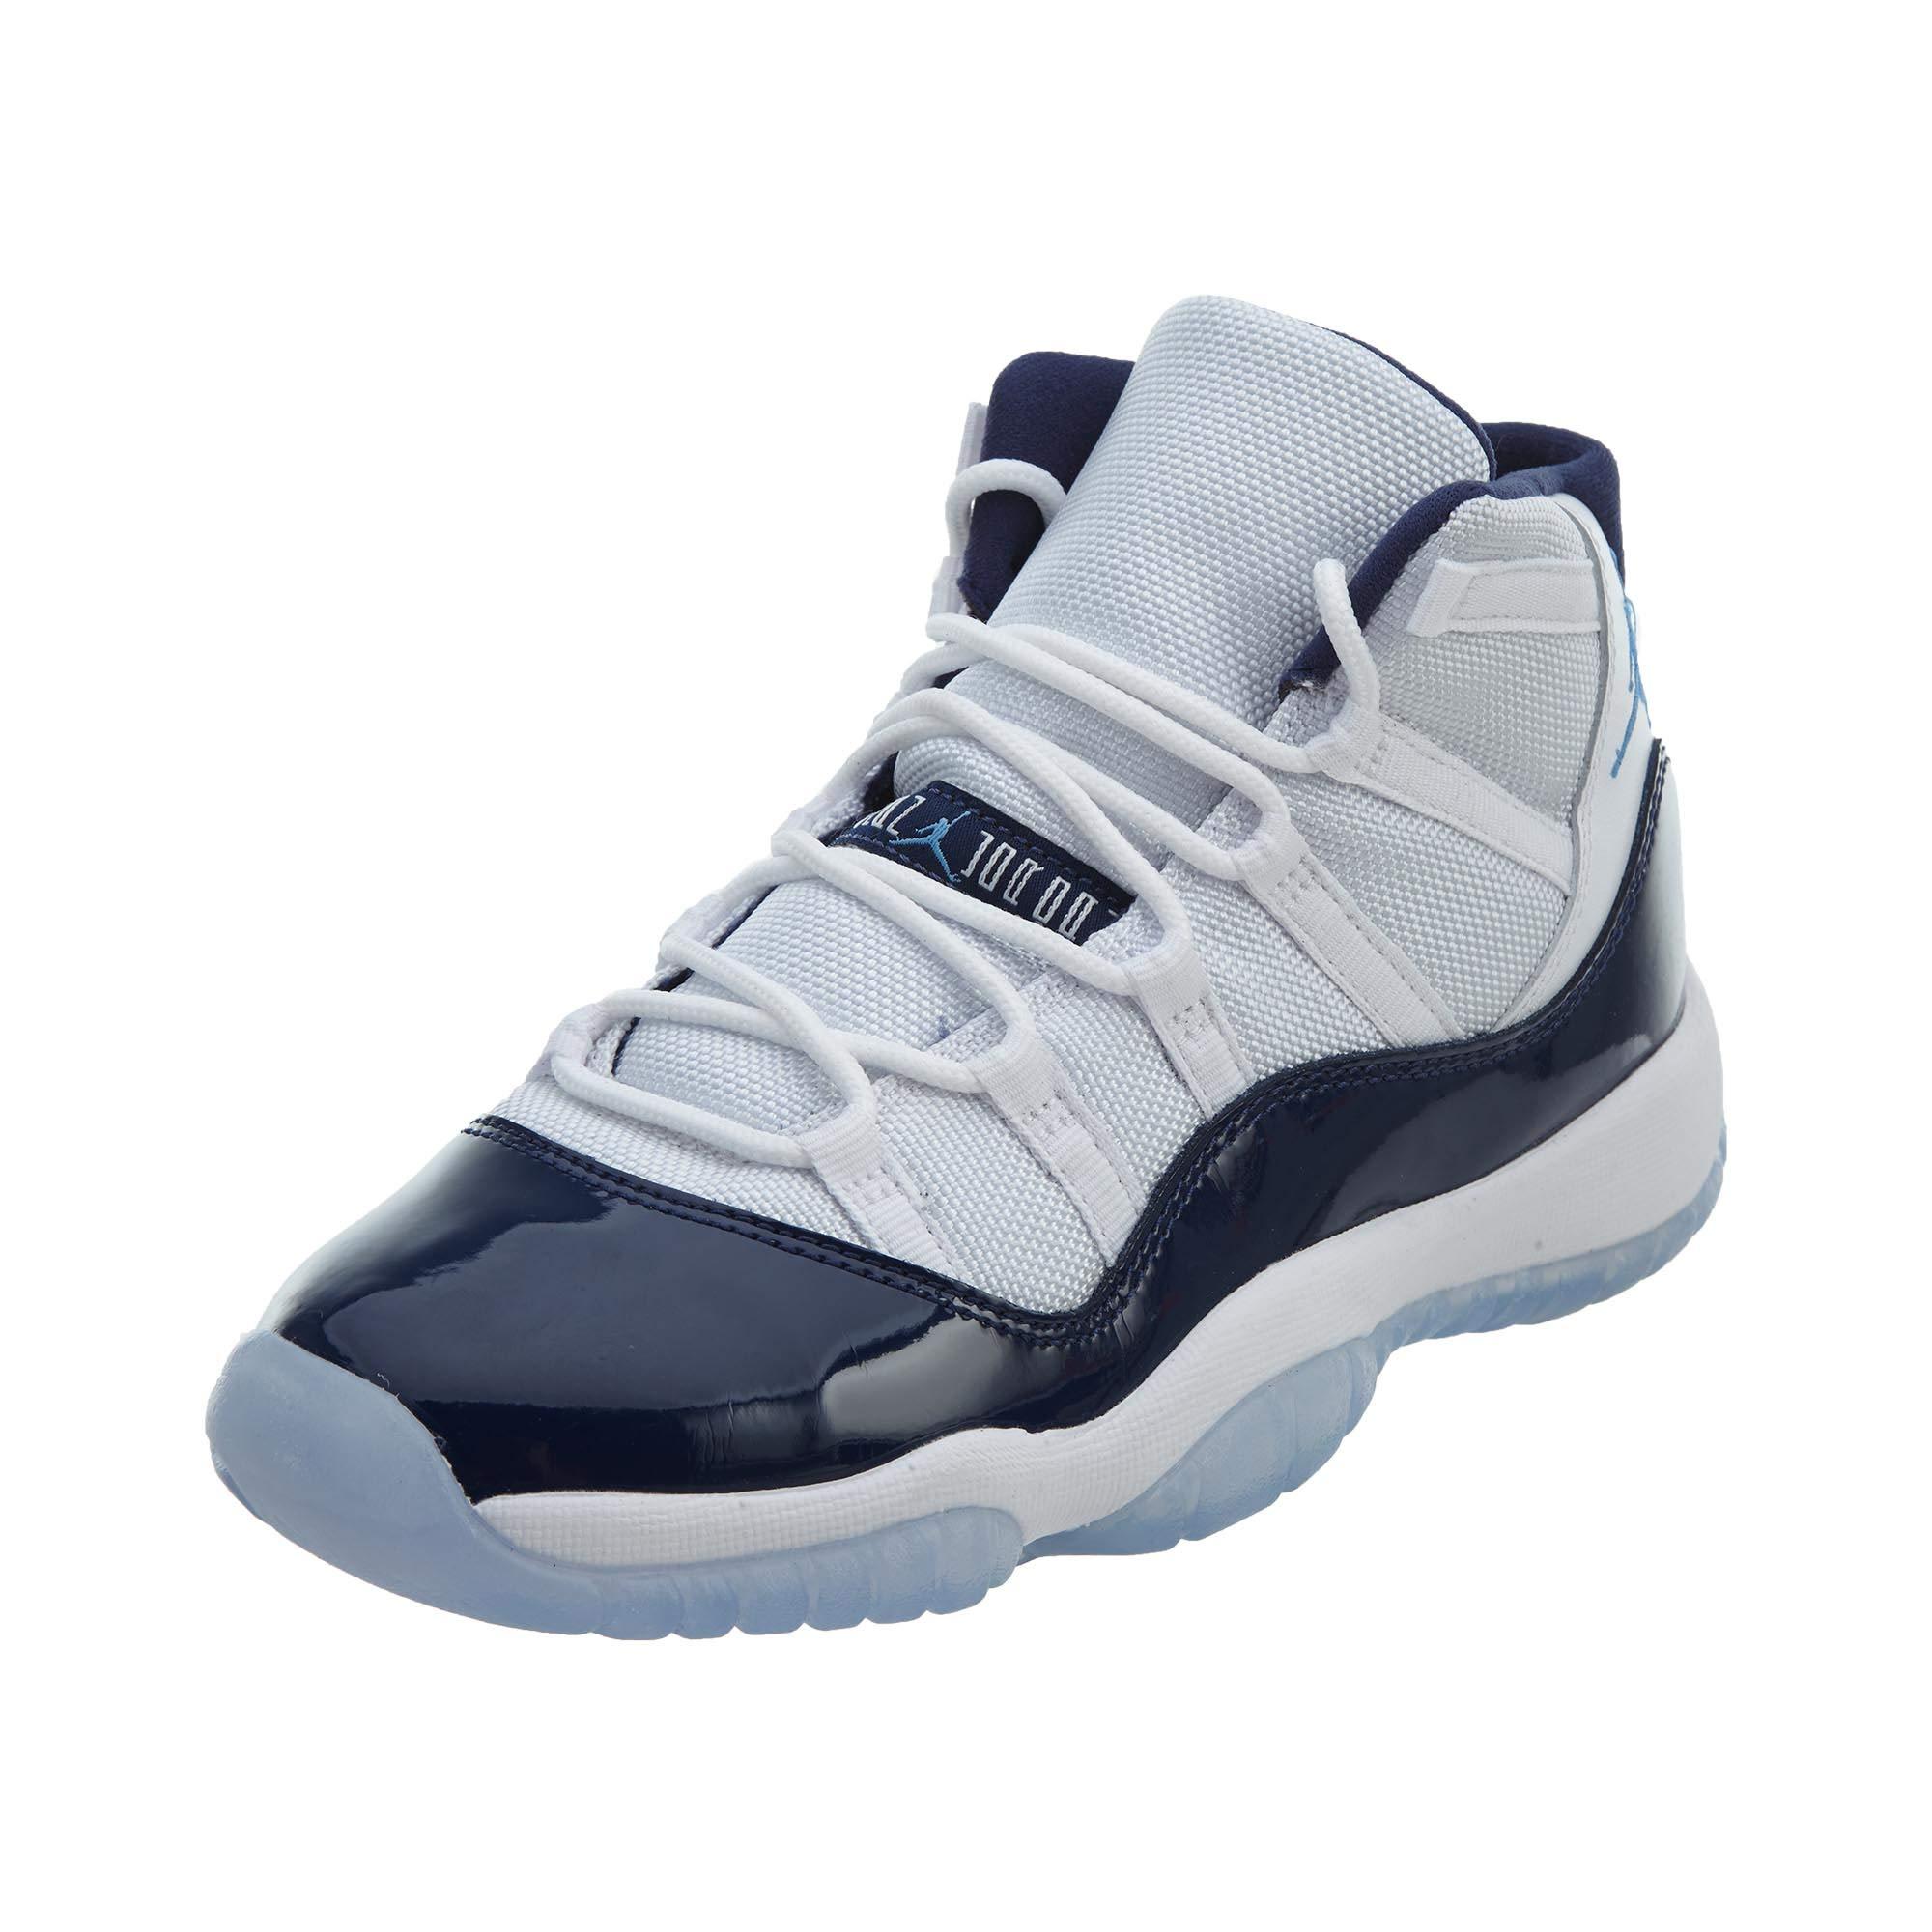 58e92a2d136 Galleon - Air Jordan 11 Basketball Shoe